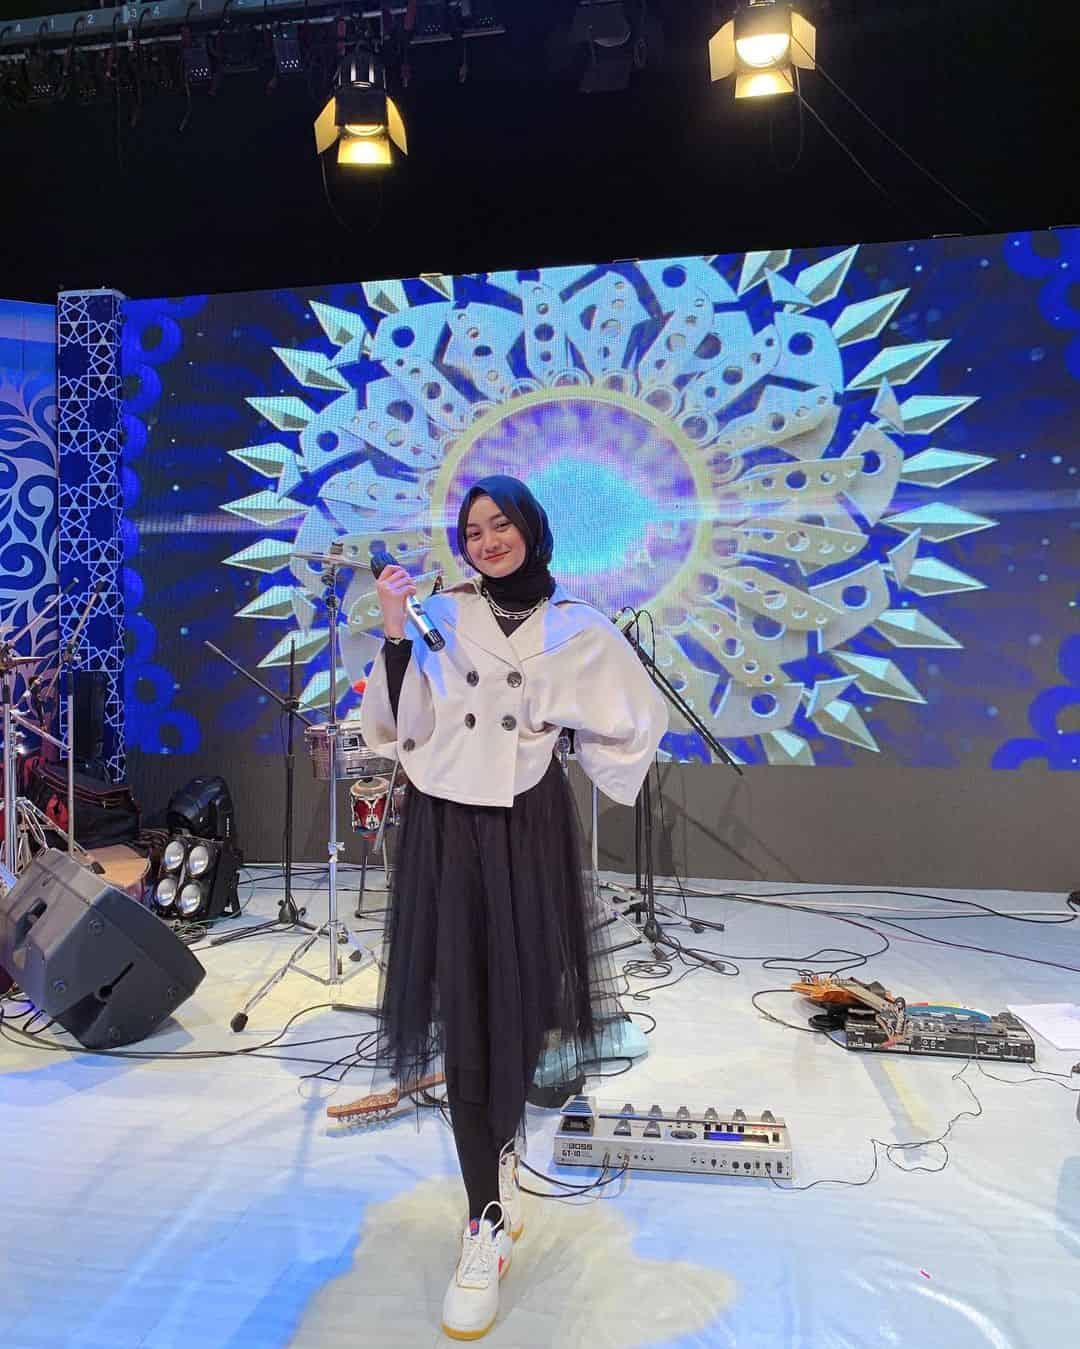 10 Potret Eltasya Nayasha yang Suka Cover Lagu, Pernah Jadi Kontestan Indonesian Idol